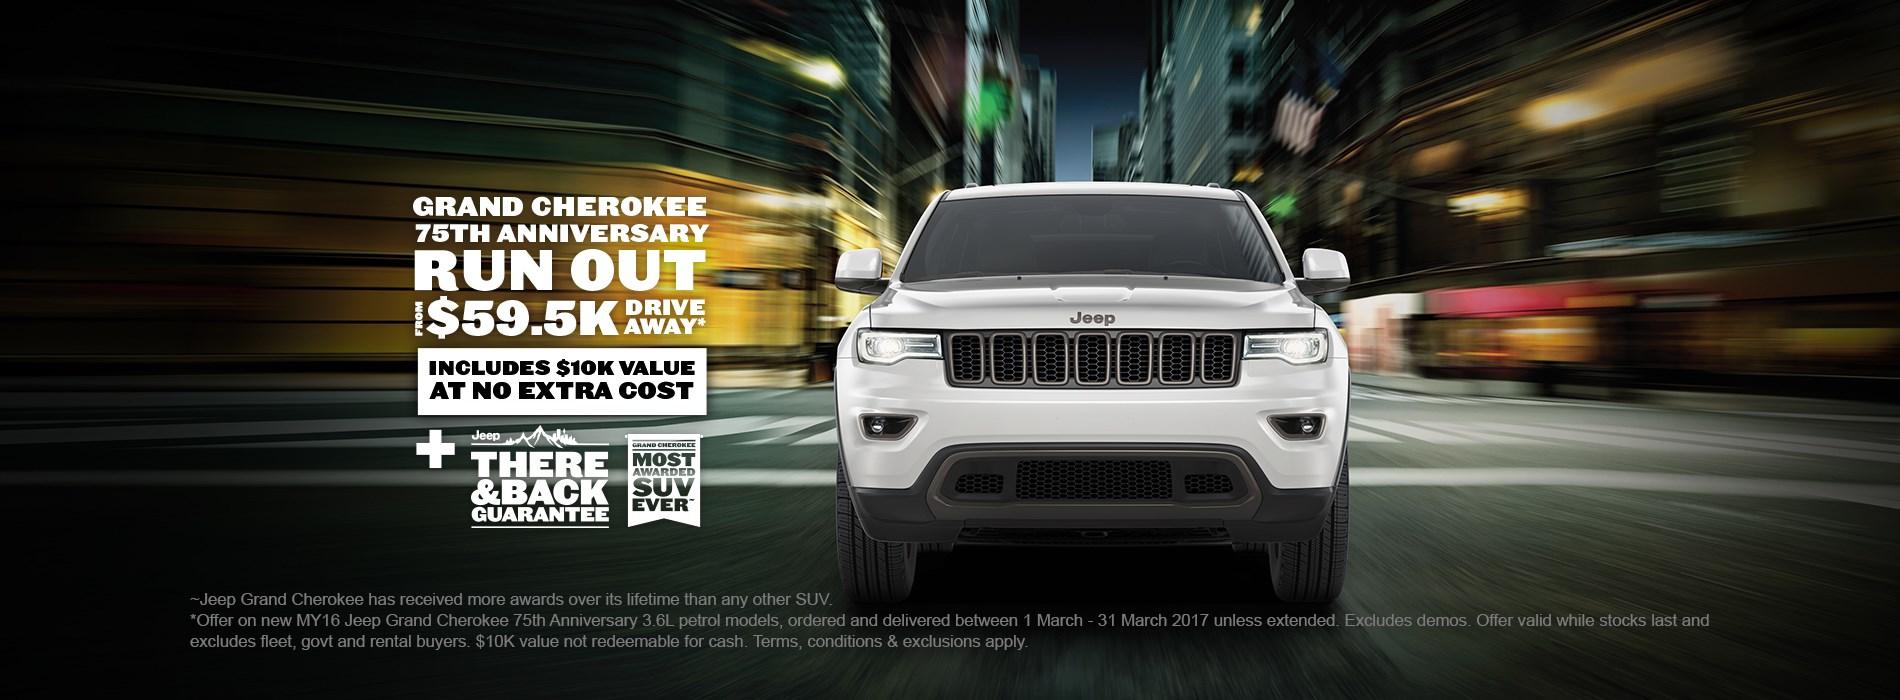 Jeep Grand Cherokee 75th Anniversary $59.5K Drive Away Offer